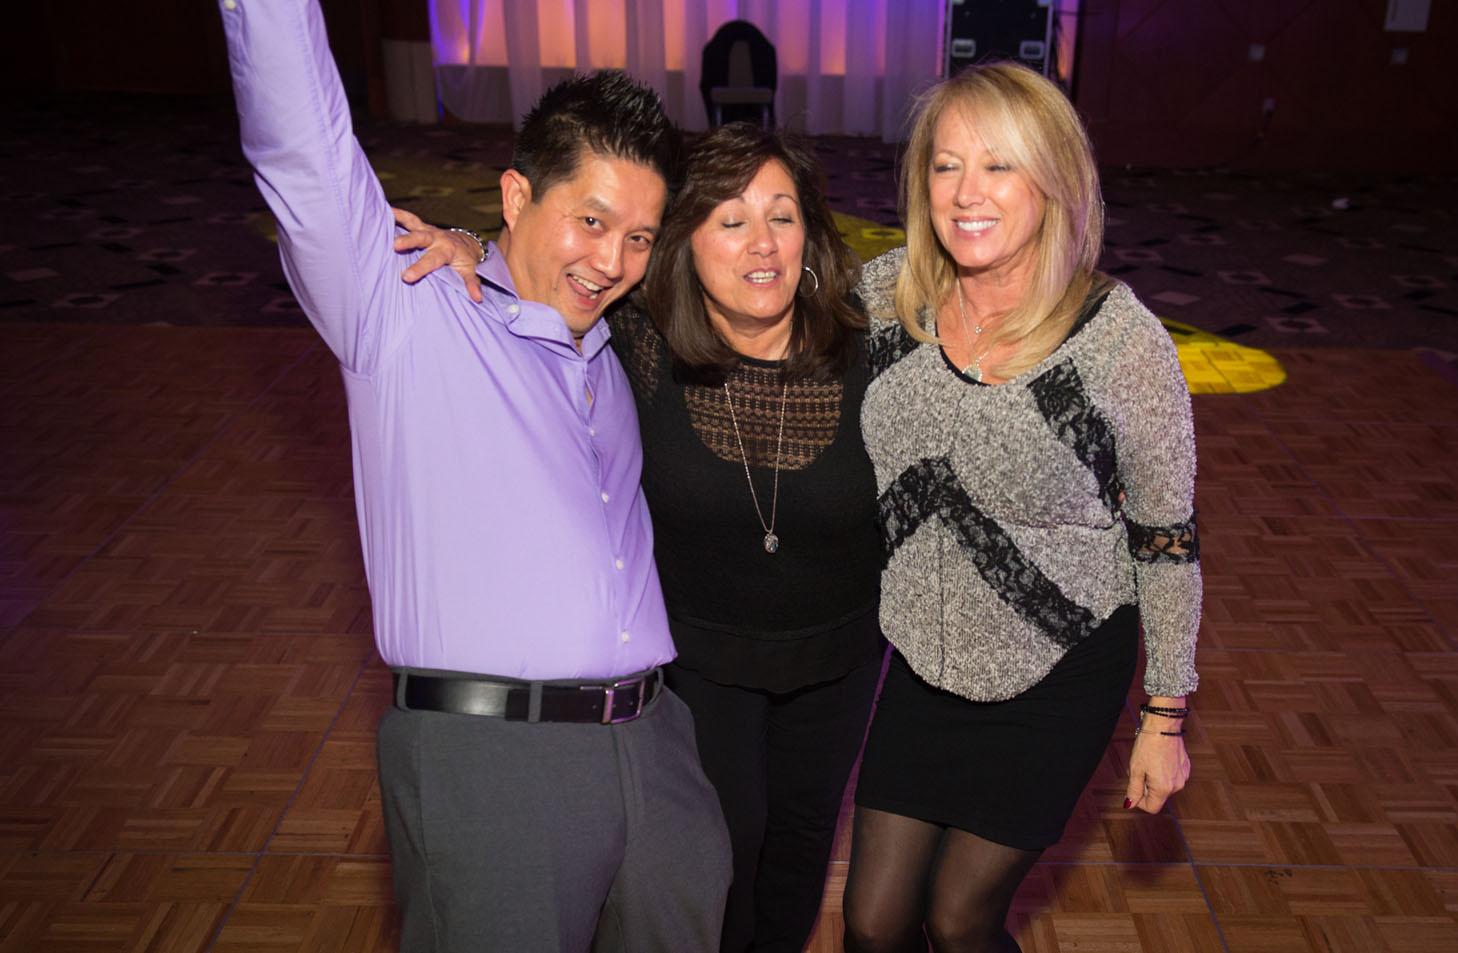 2015-12-09 ReMax Corpoarte Event - The Borgata - Atlantic City NJ - Photo Sesh - 2015-5081.jpg